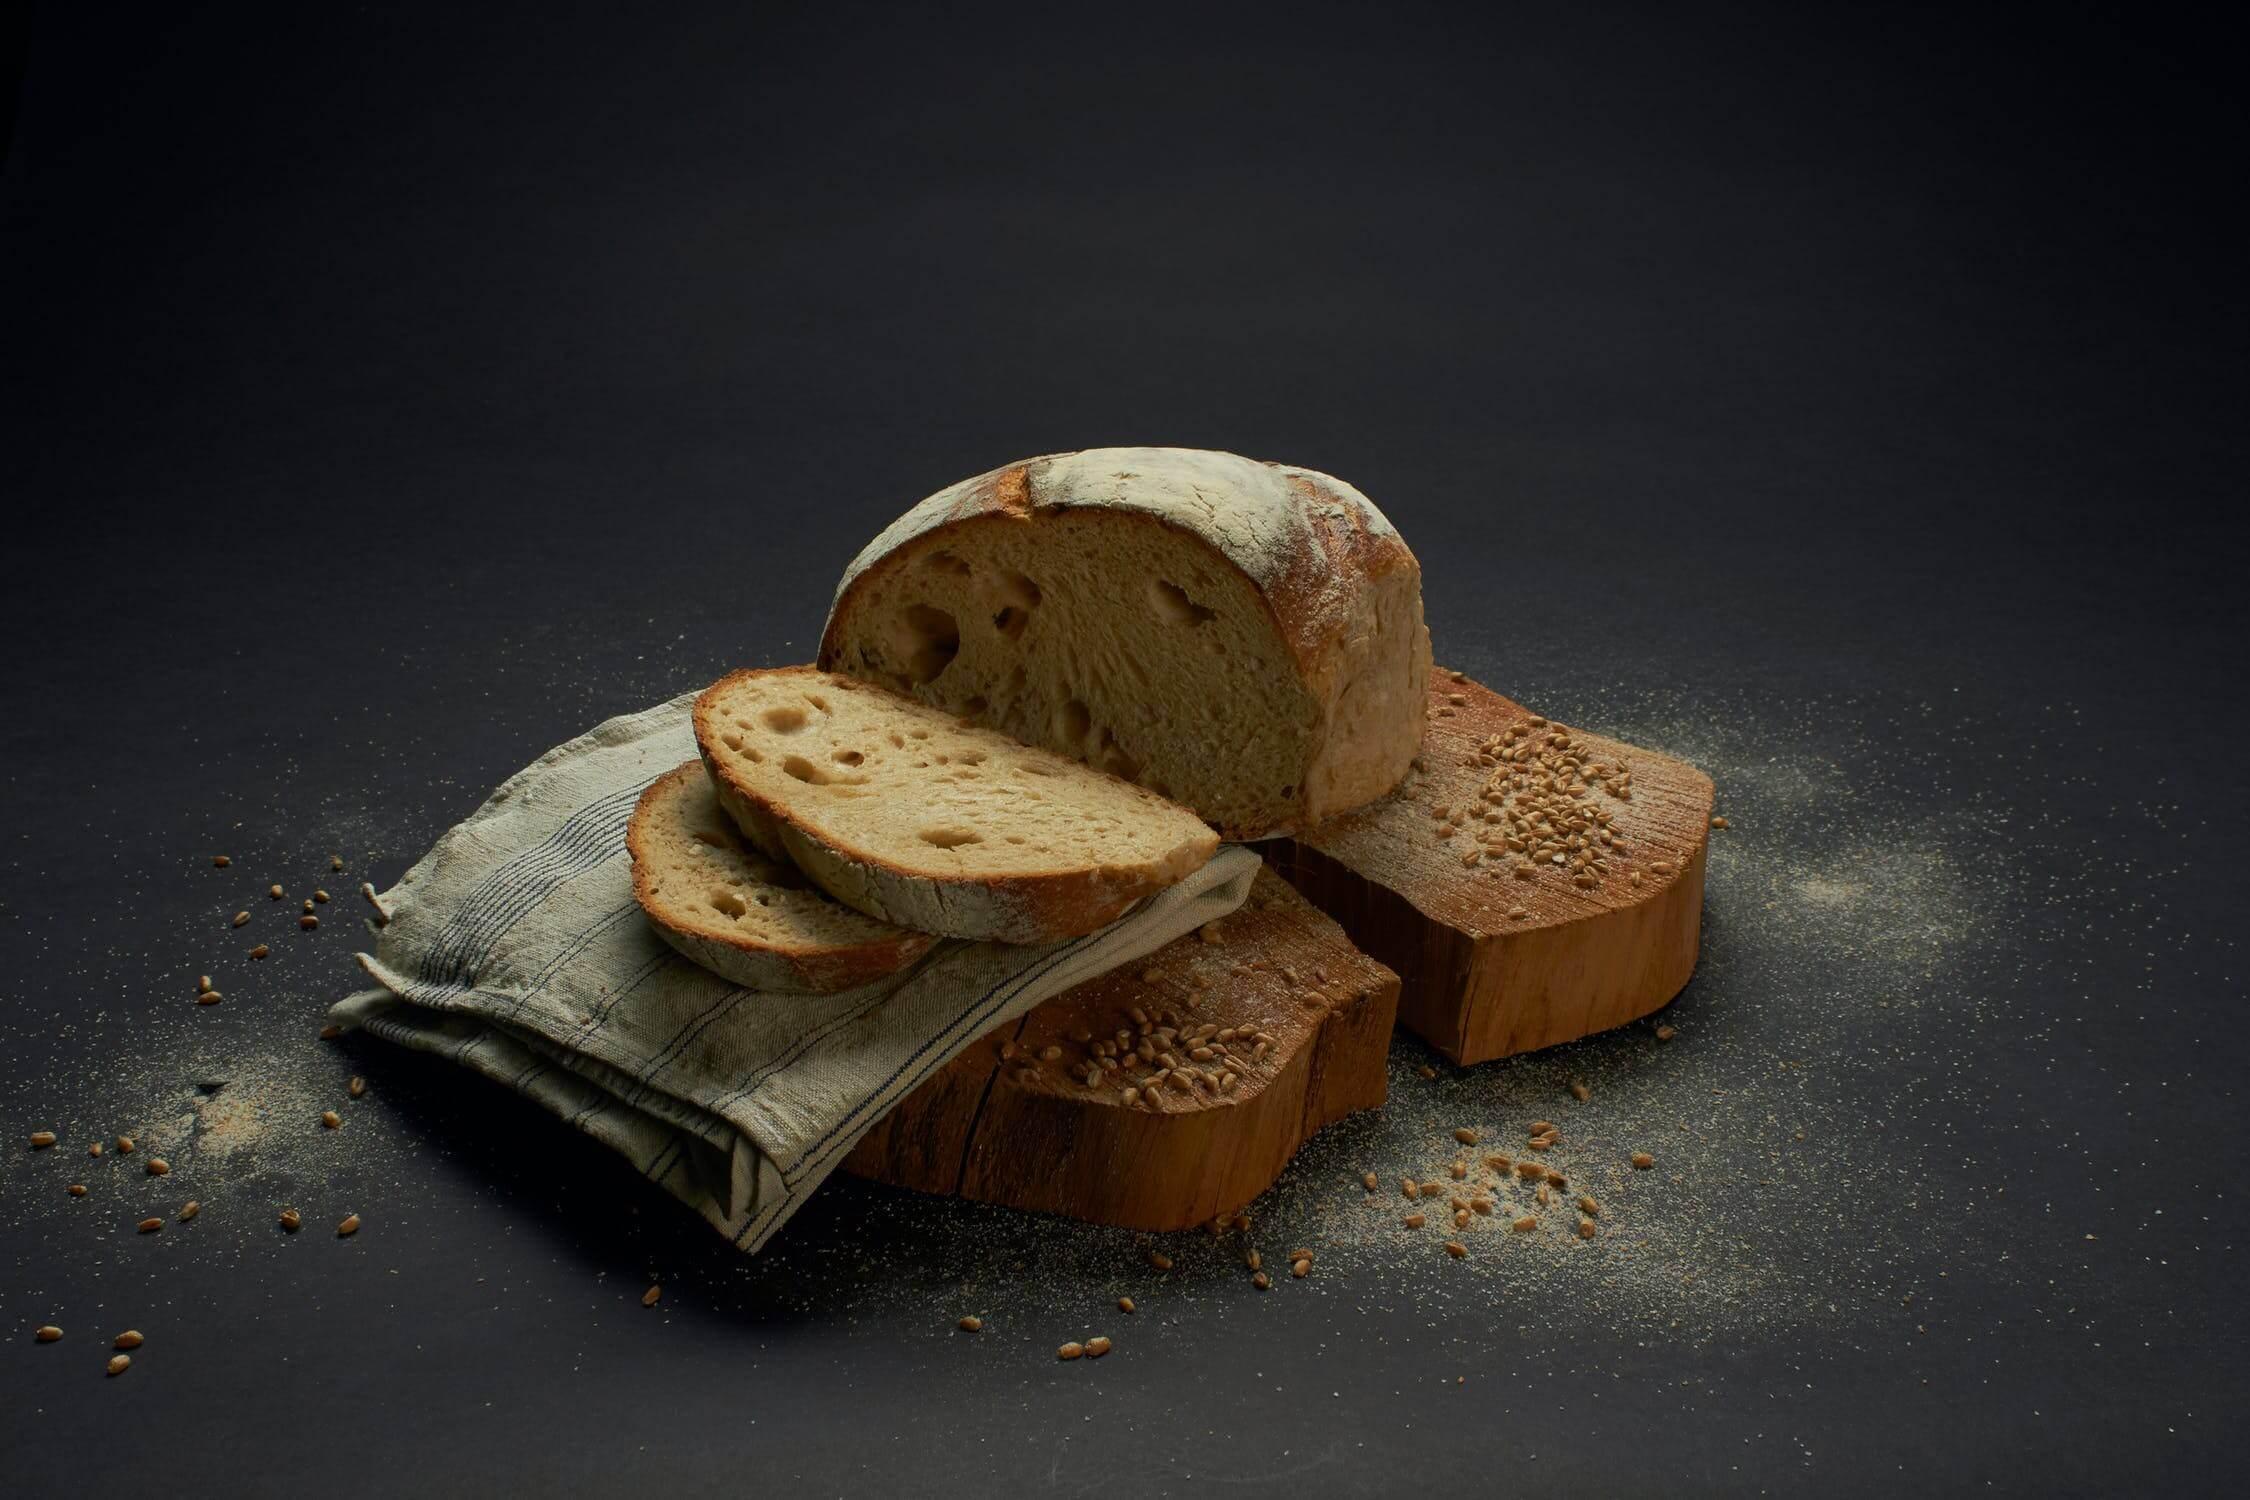 Homemade Bread Making: The Most Popular Quarantine Activity in Turkey